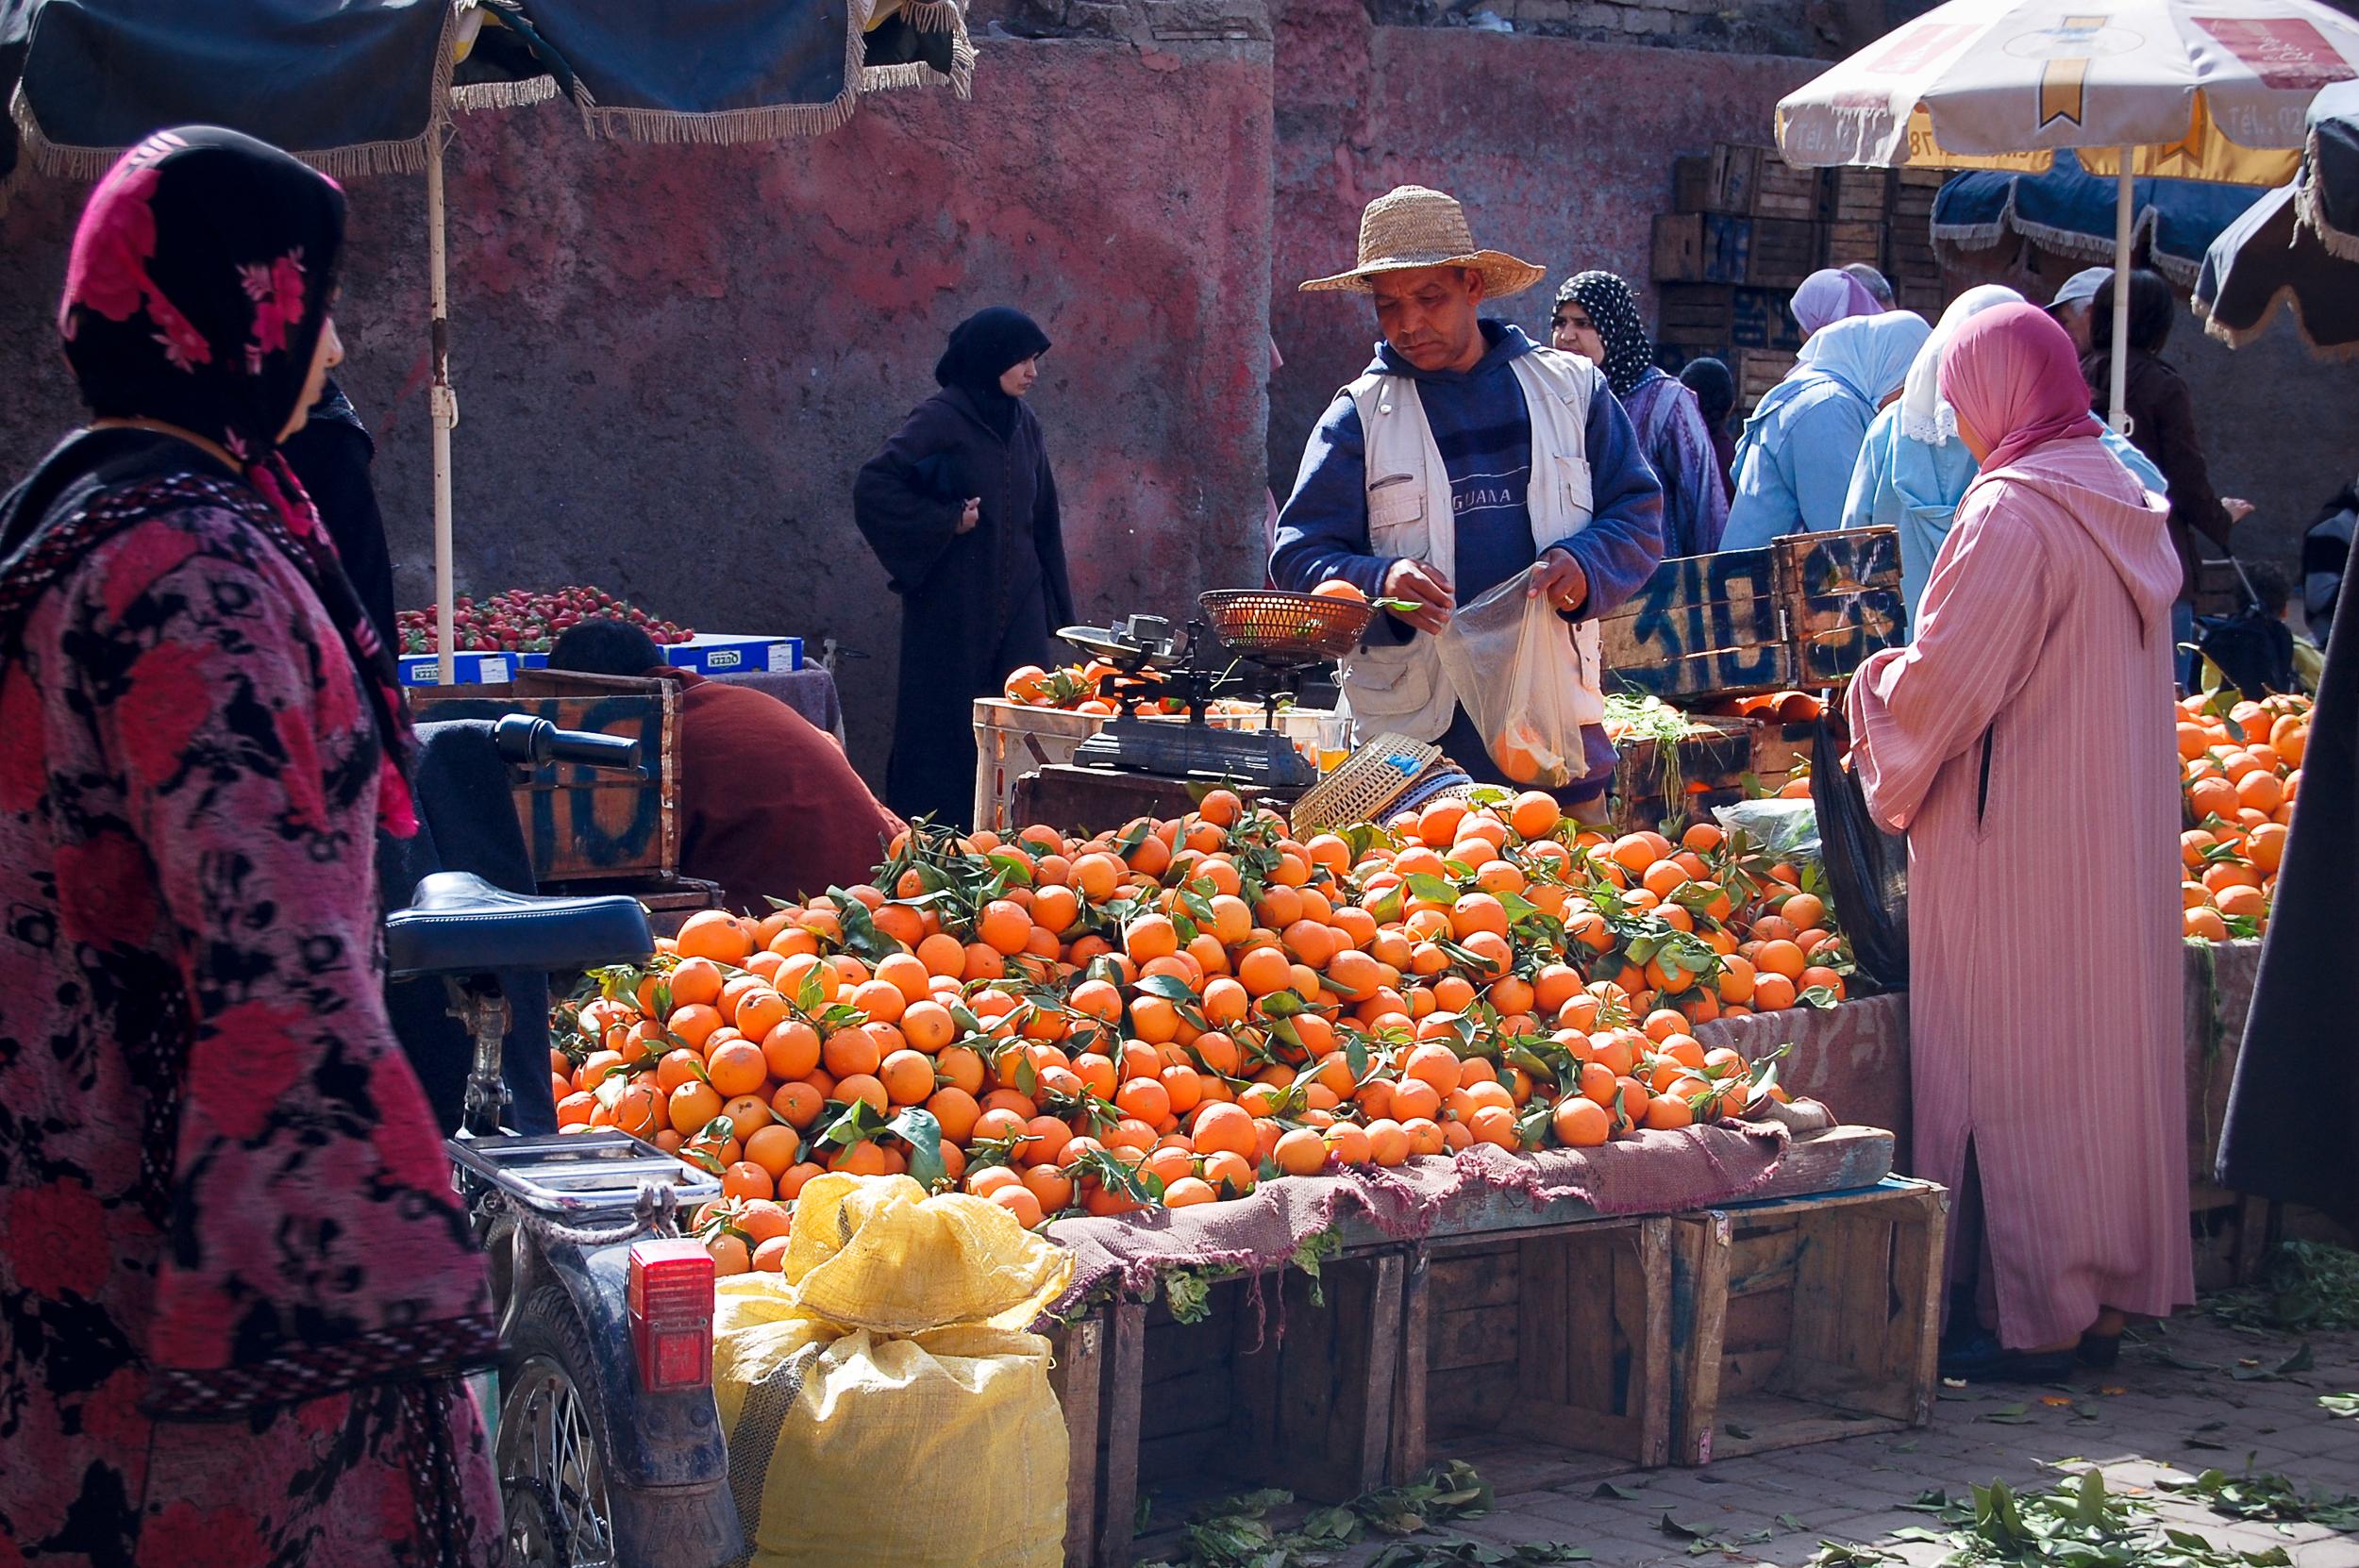 morocco (16 of 39).jpg